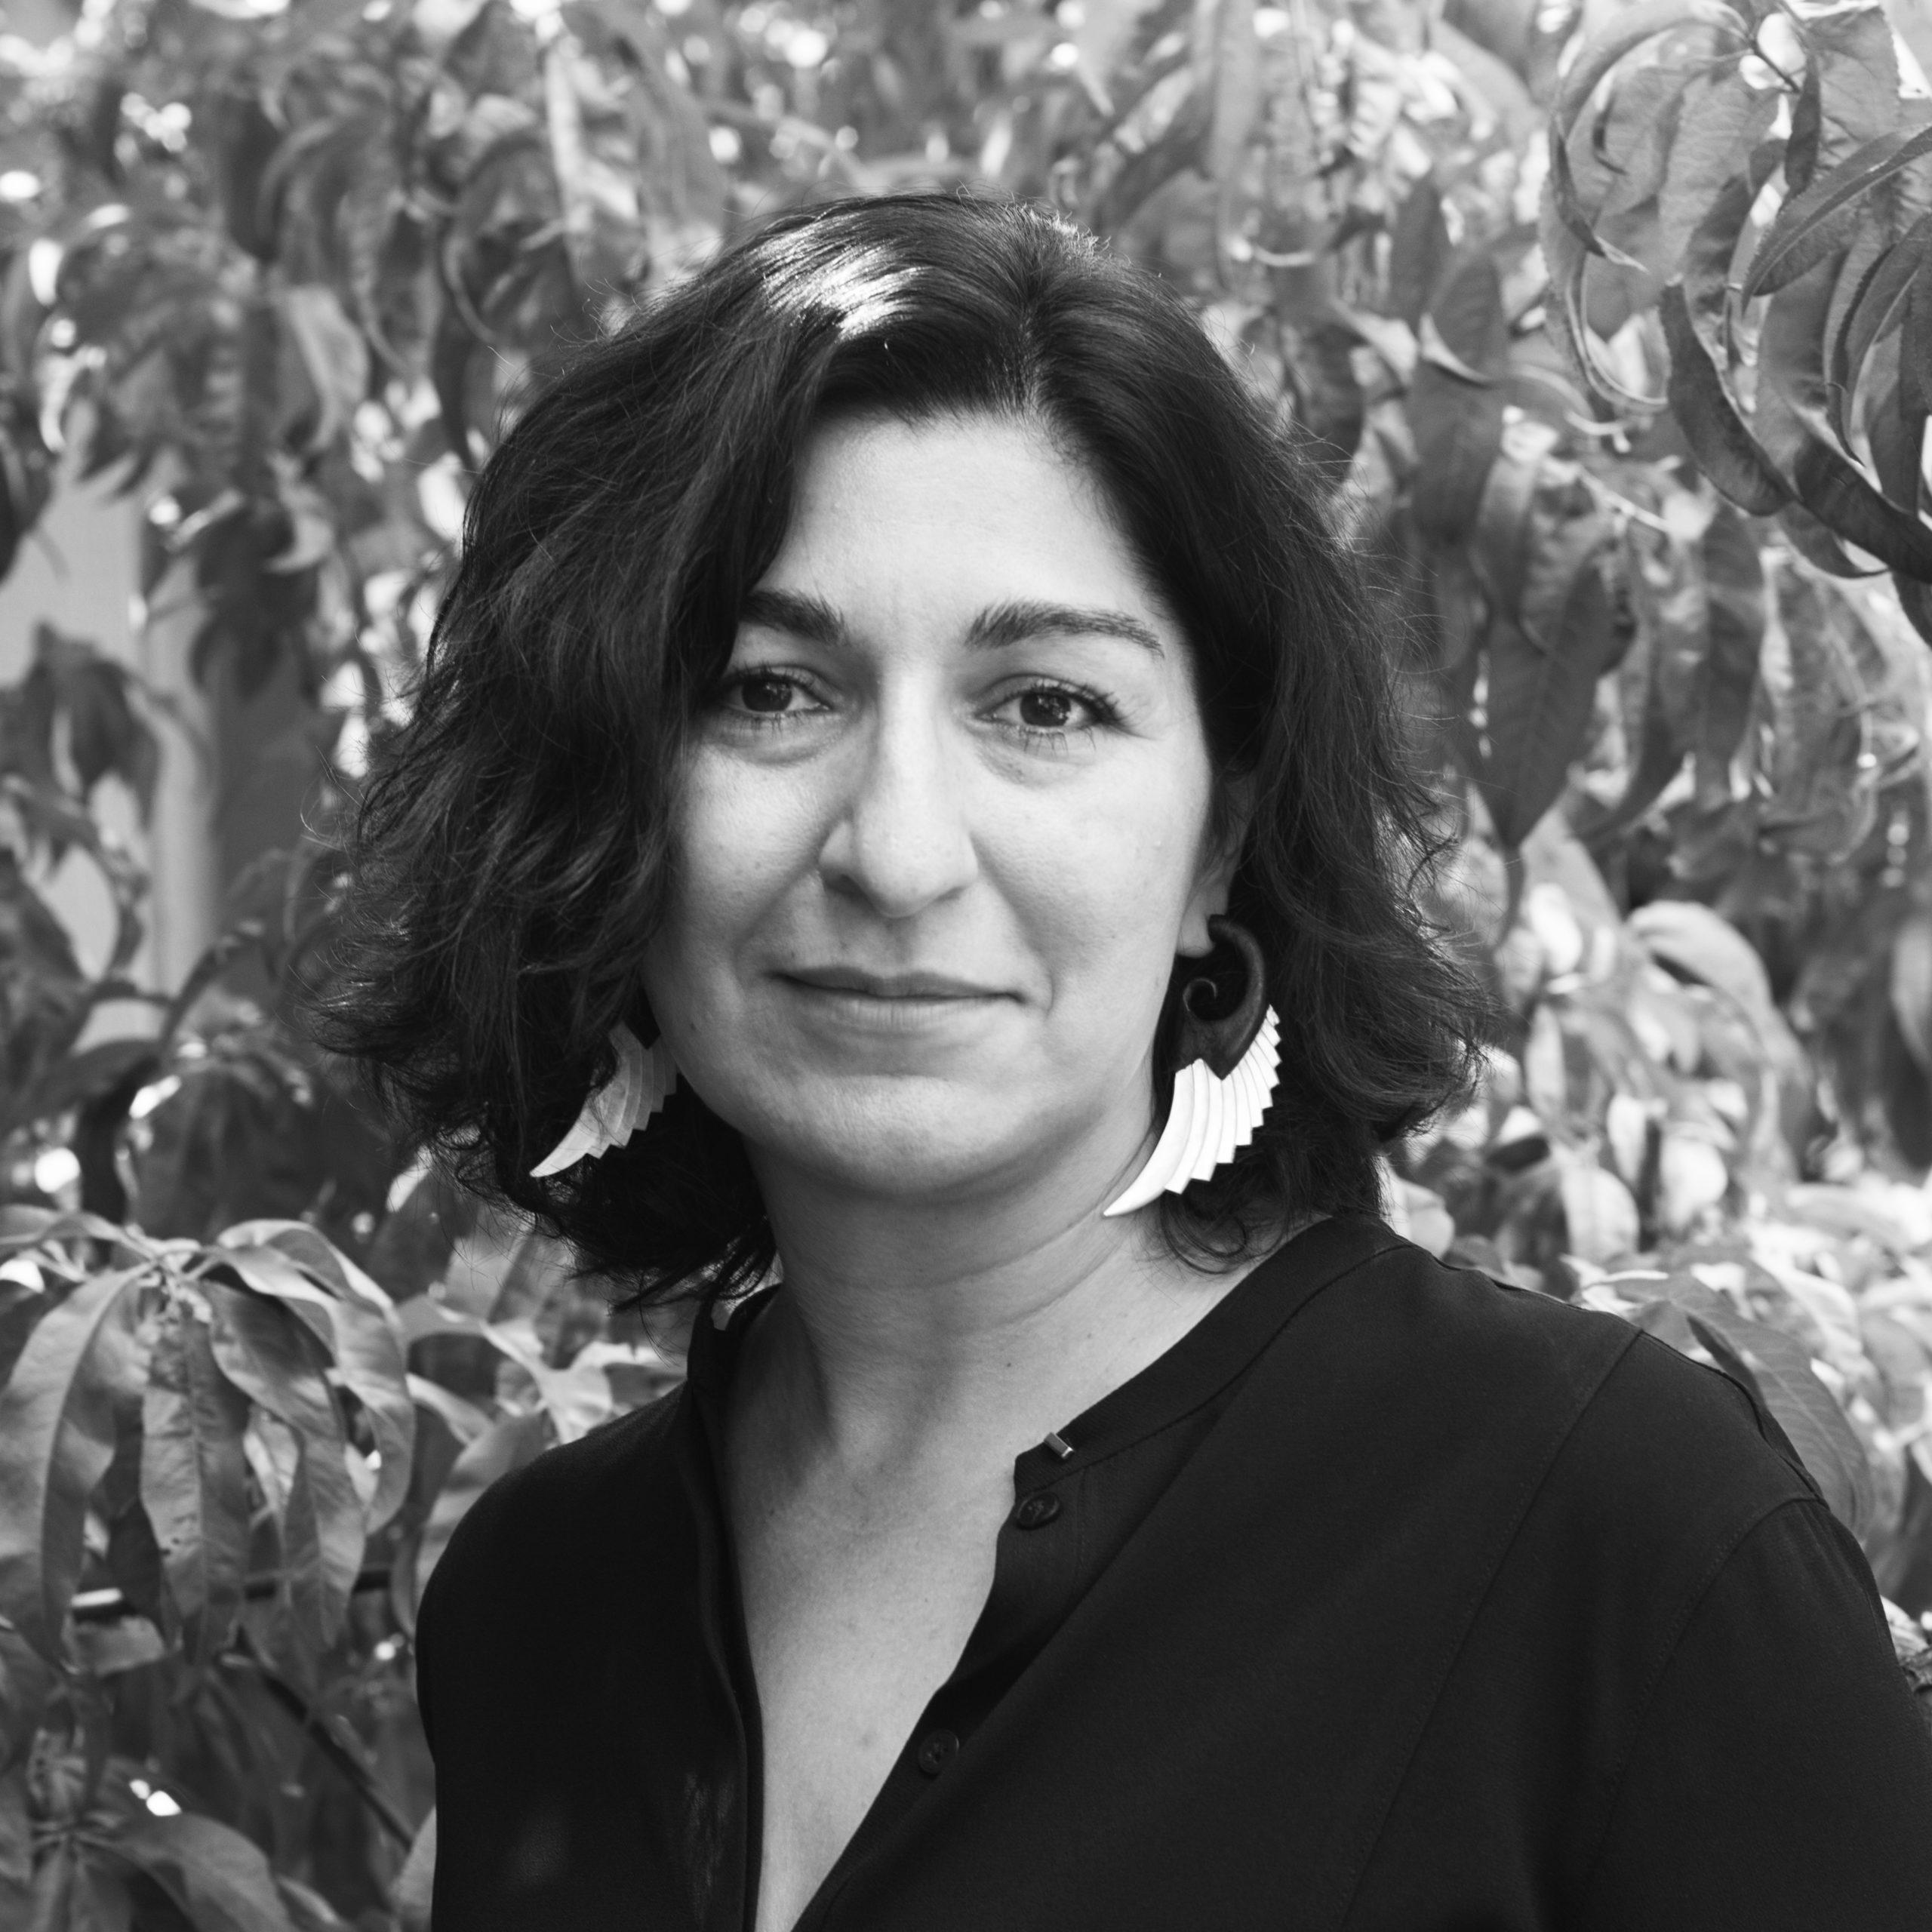 Yasmeen Siddiqui